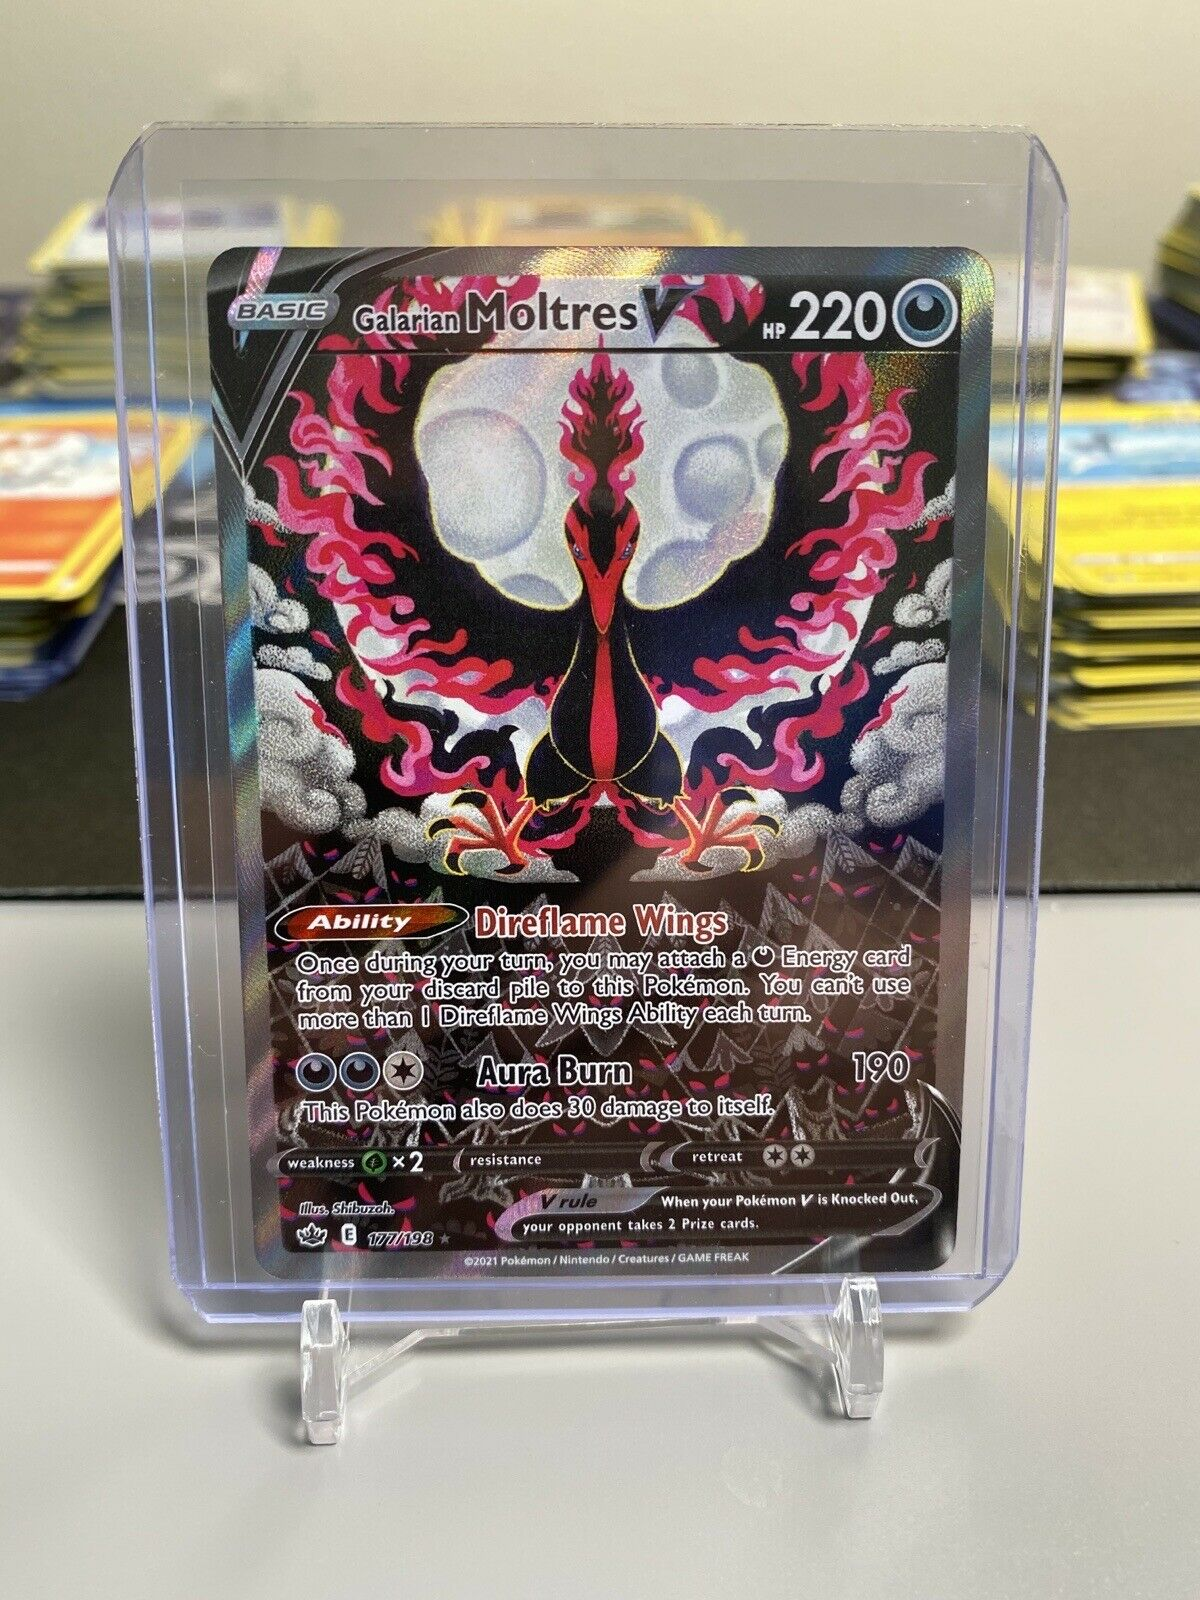 Pokémon Chilling Reign Galarian Moltres V Alternate Art 177/198